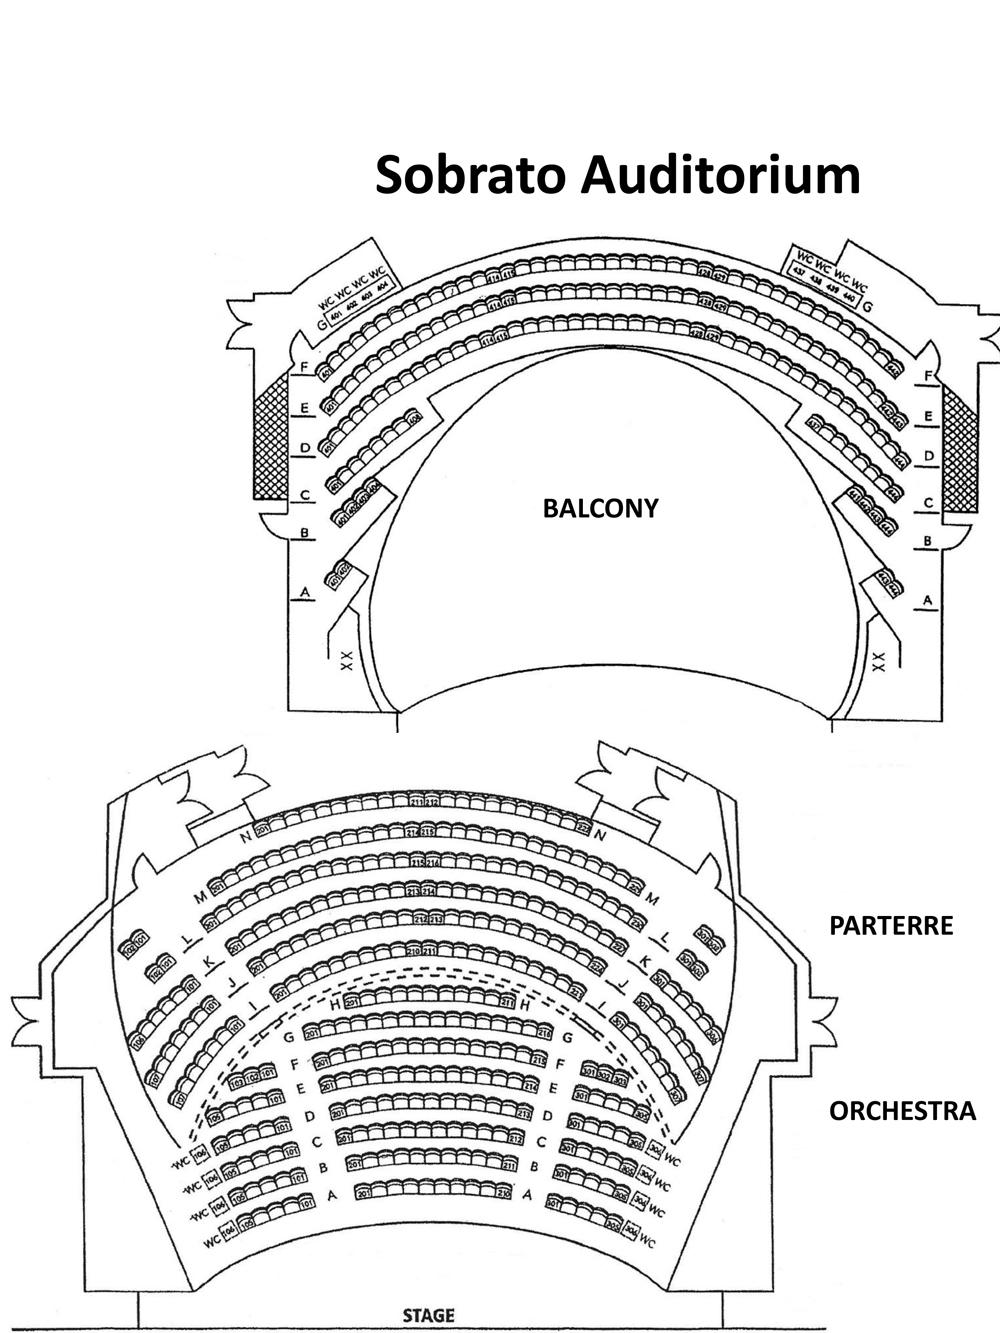 Hammer Theatre Center San Jose Tickets Schedule Seating Charts Black Box Diagram Ucf